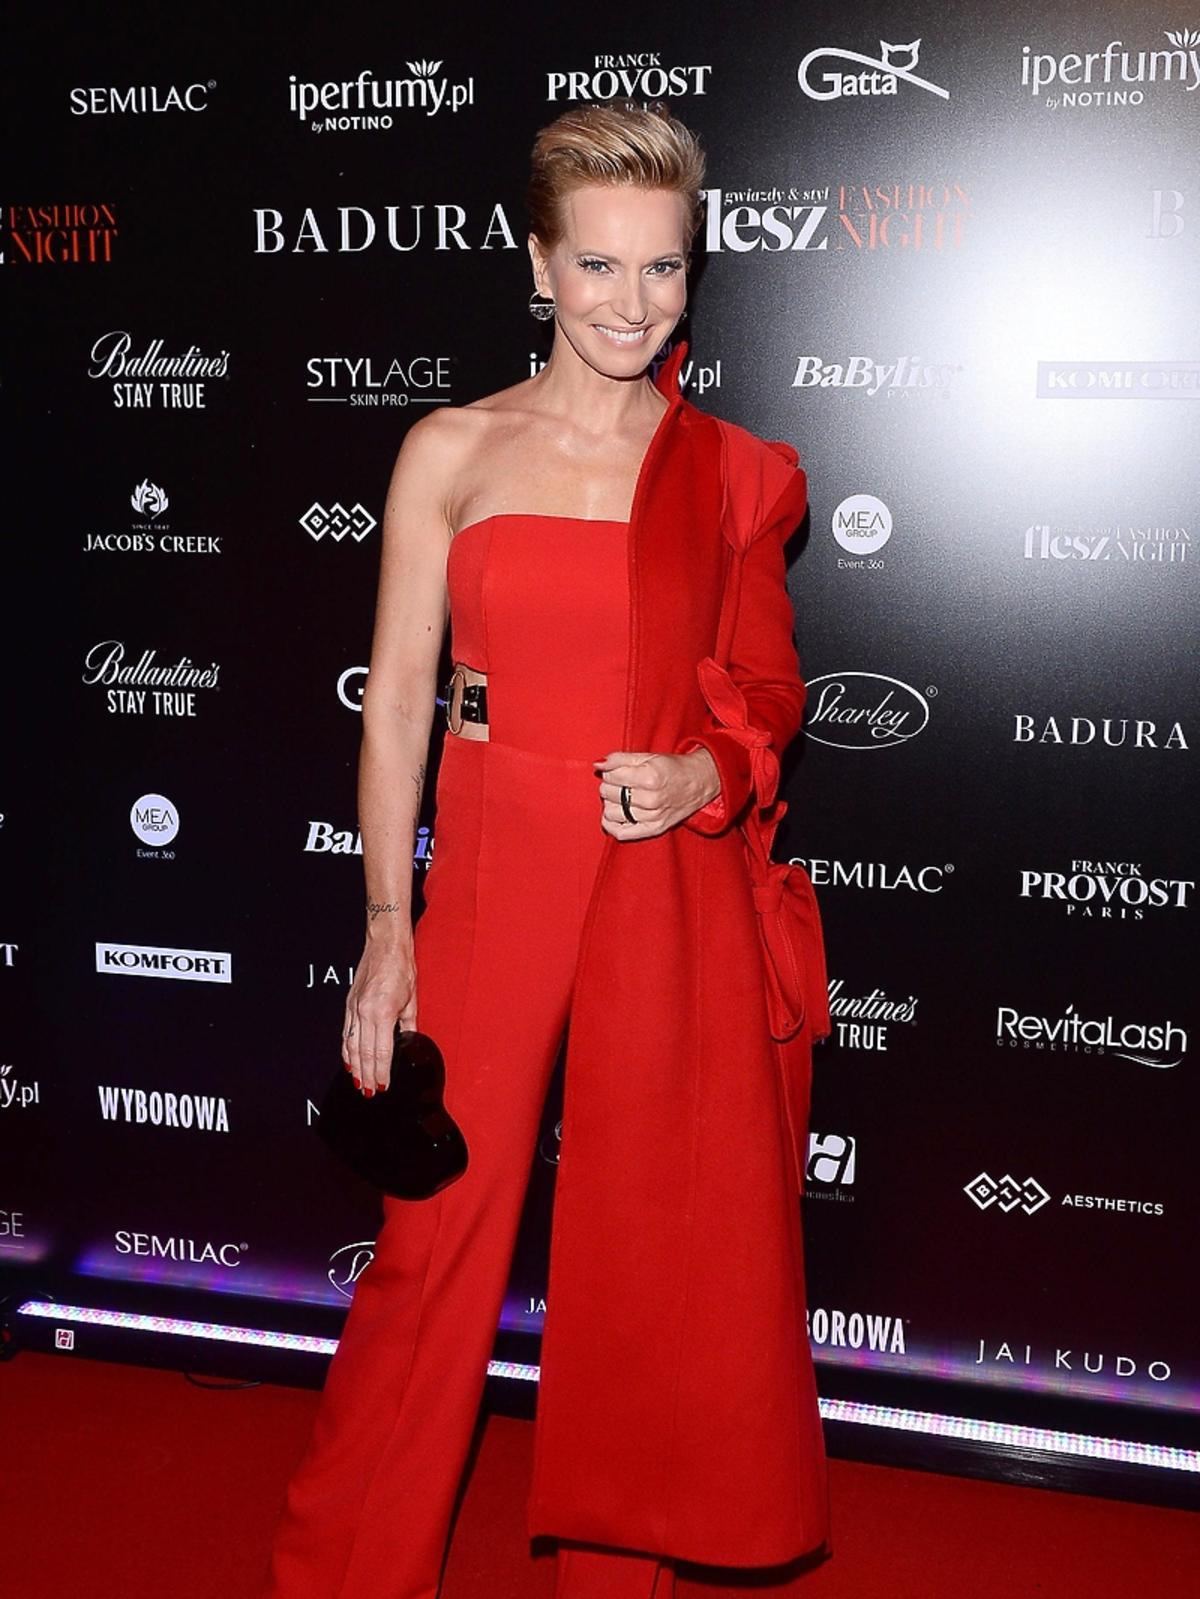 Paulina Smaszcz Kurzajewska na Flesz Fashion Night